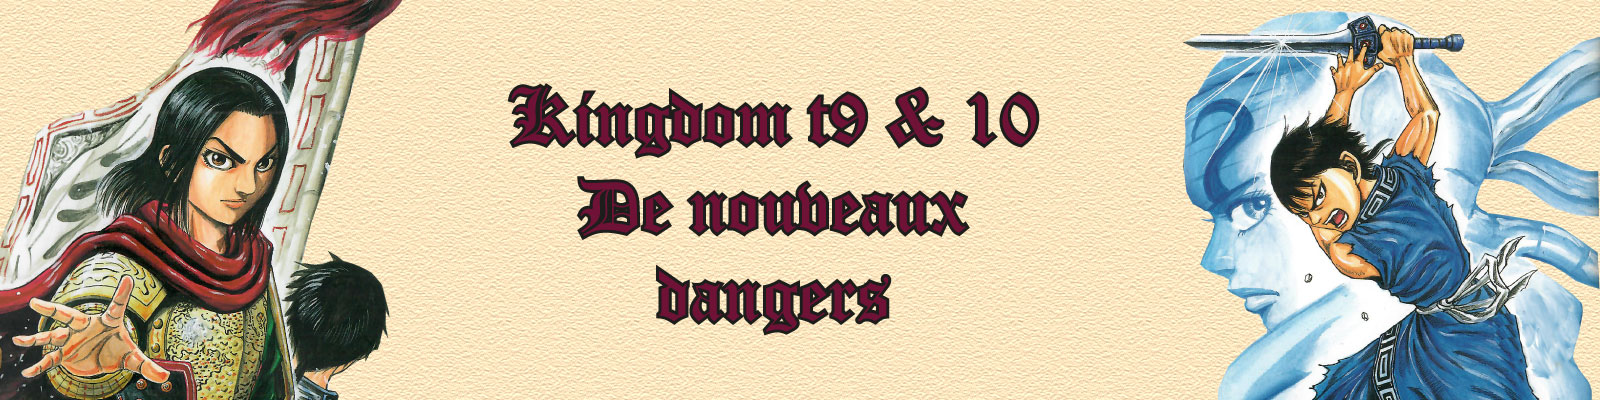 Kingdom tome 9 & 10